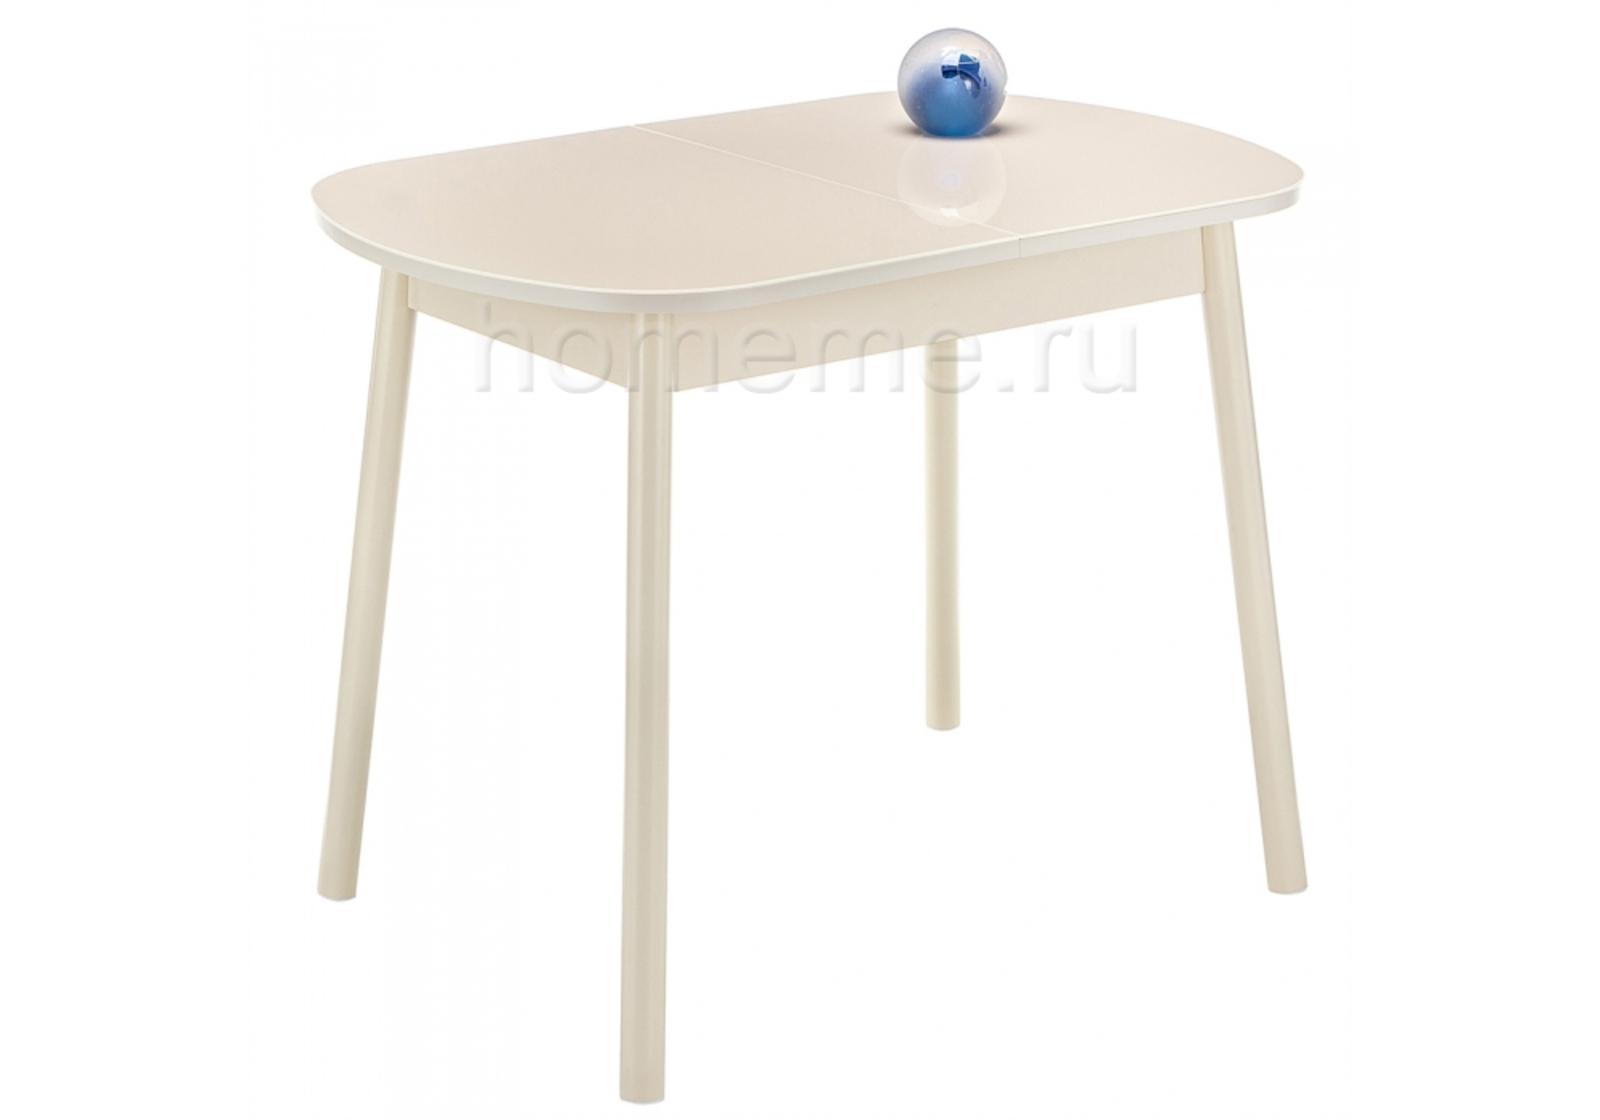 Кухонный стол HomeMe Вивьен 94 кремовый 302624 от Homeme.ru